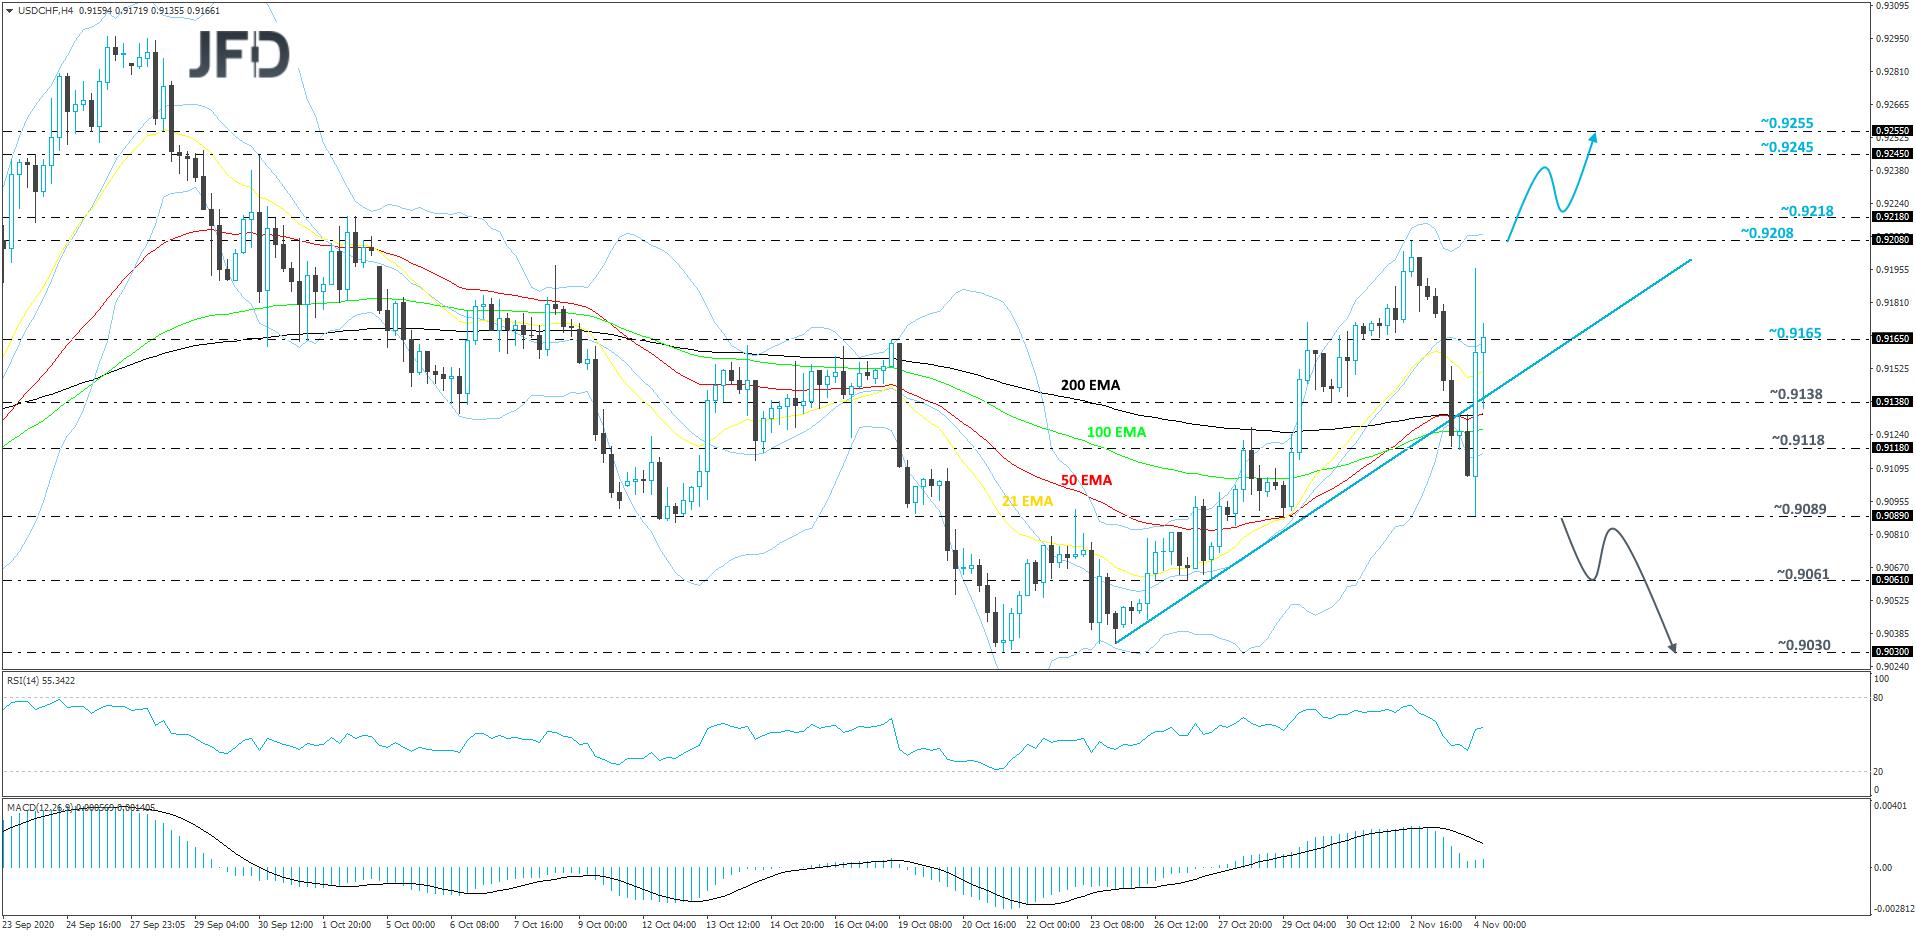 USD/CHF 4-hour chart technical analysis